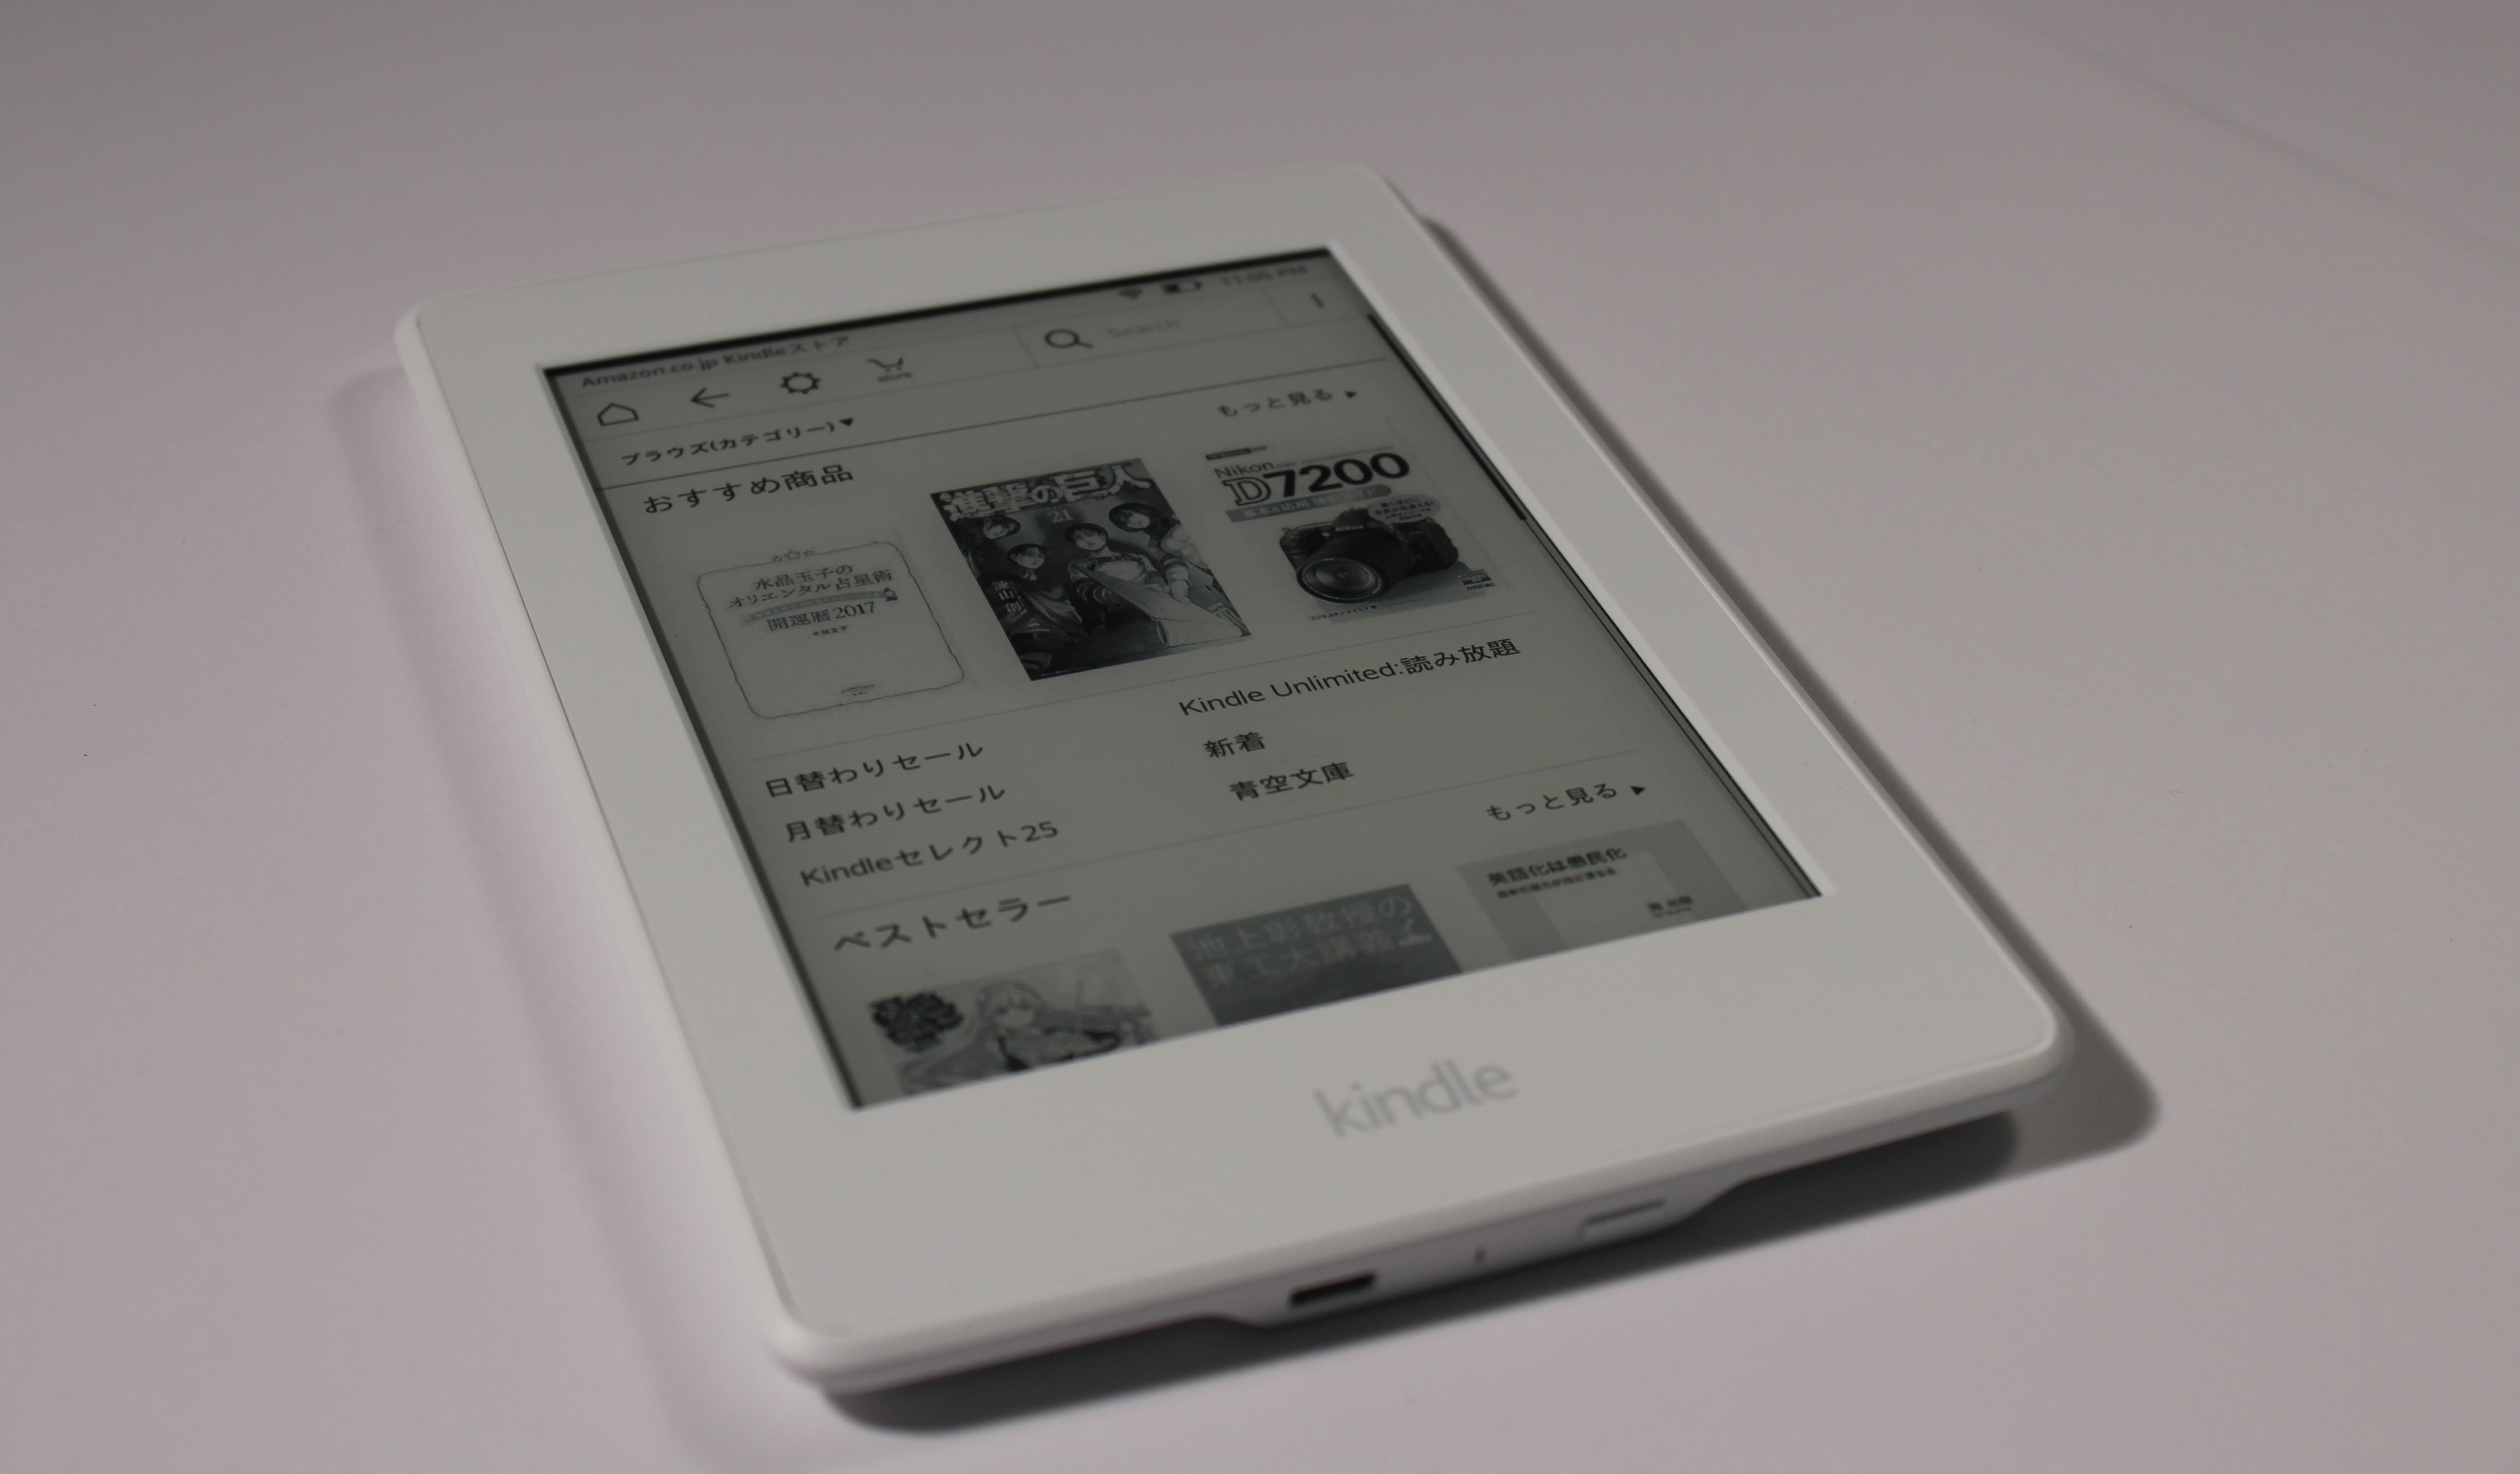 Kindle Vs Sony Reader: Amazon Kindle Manga Model Review